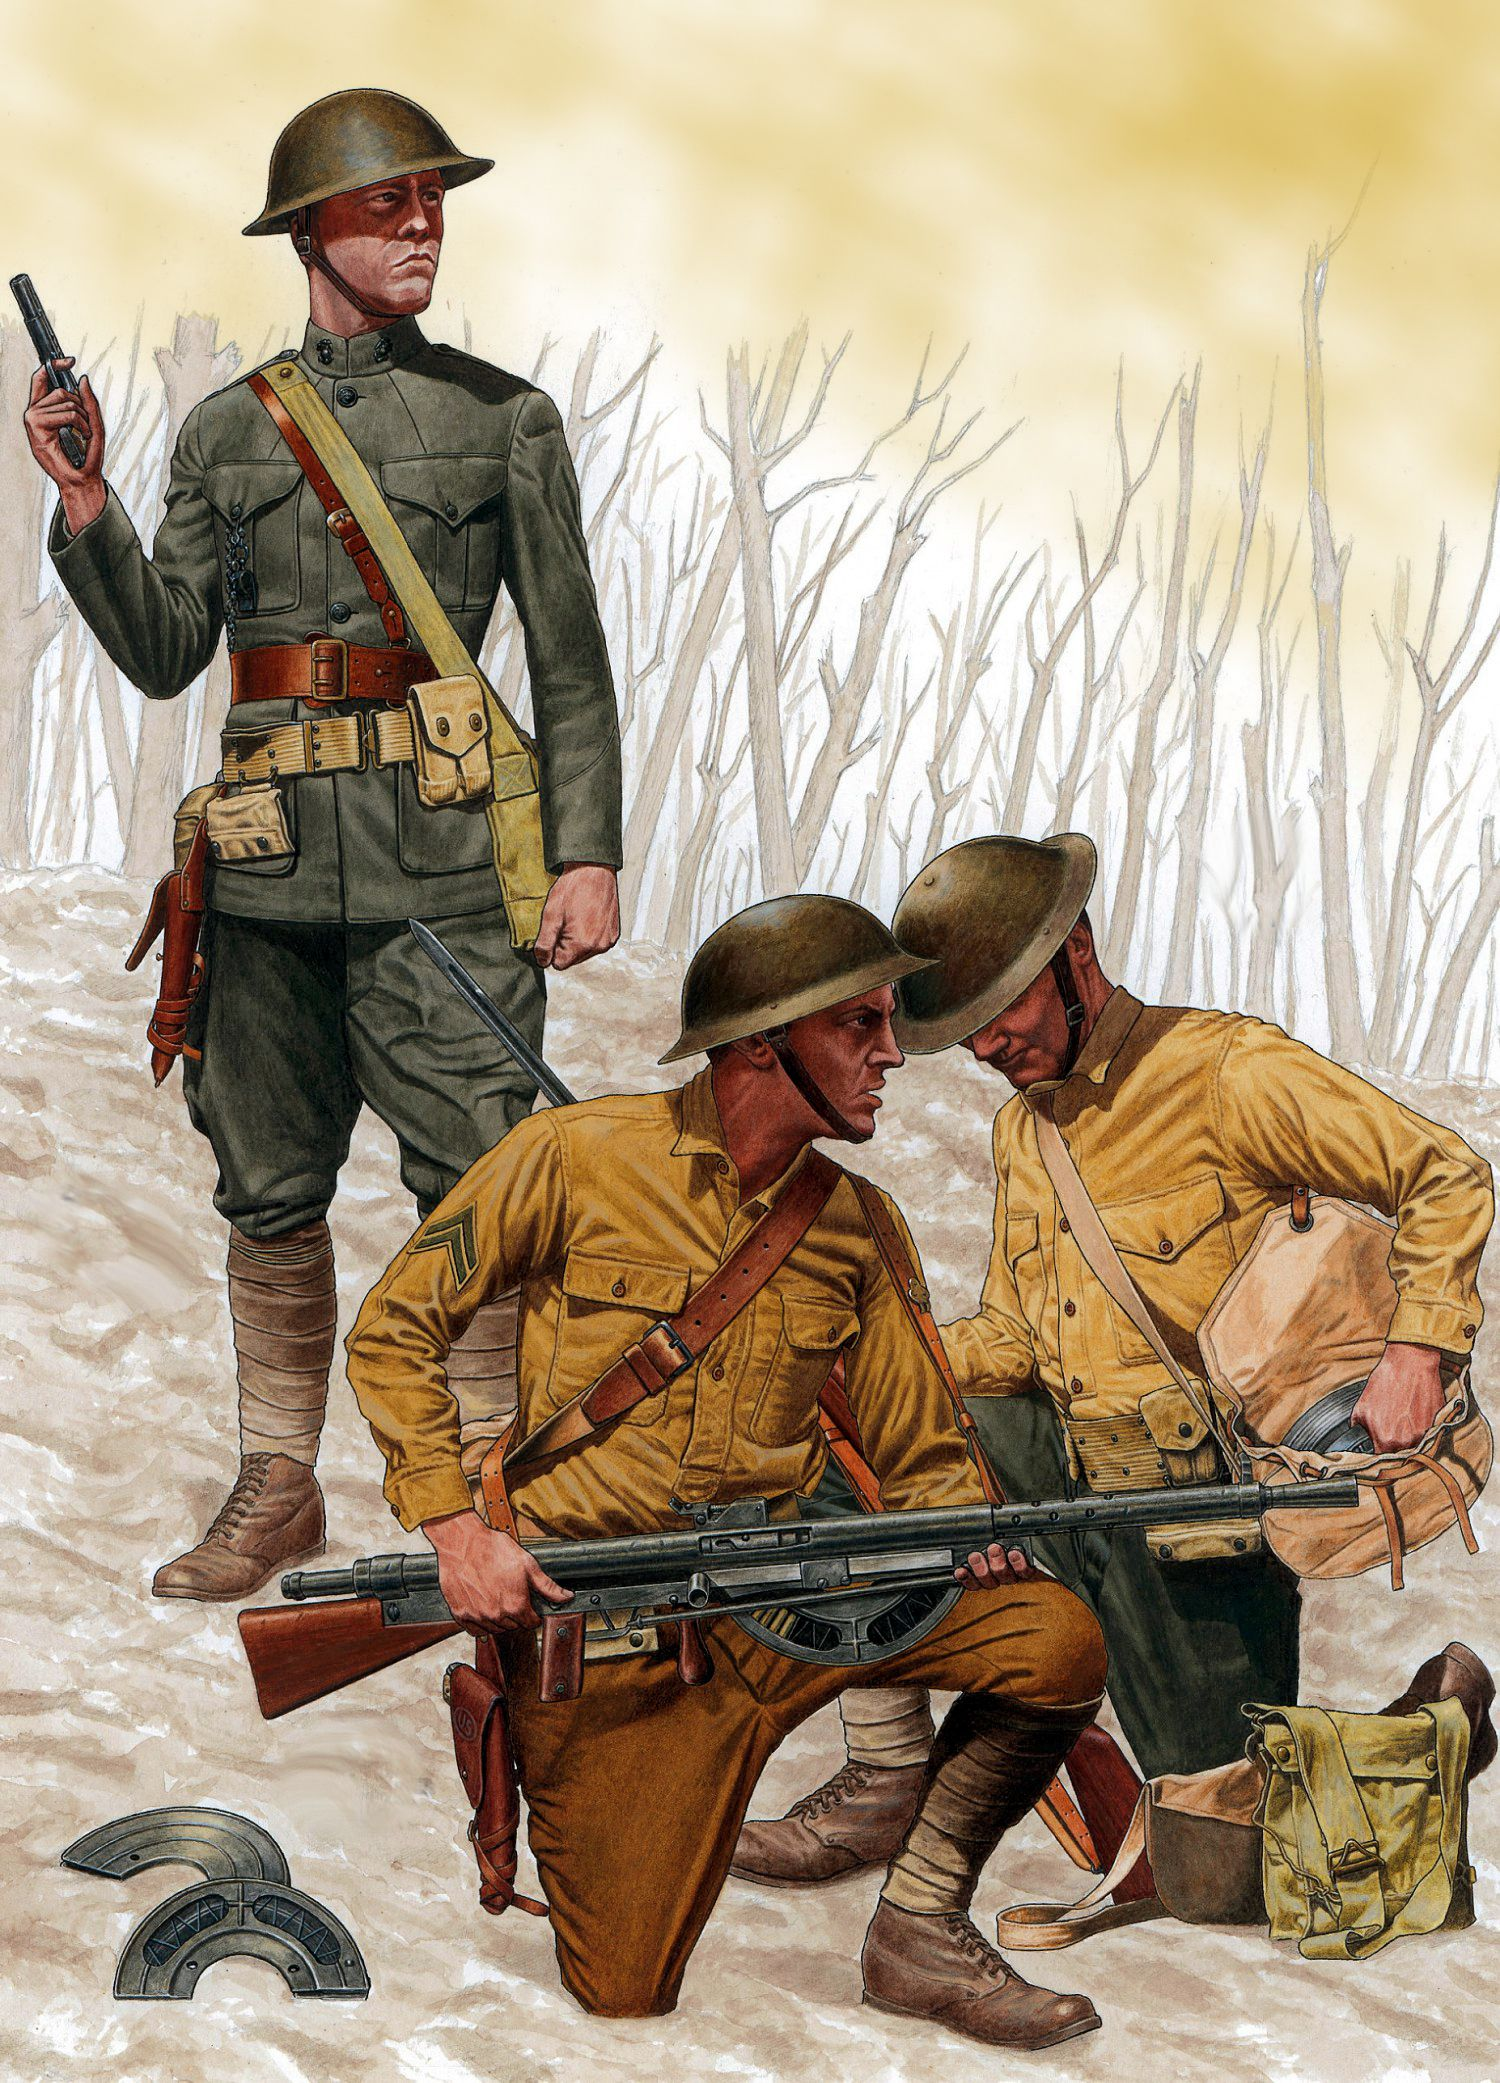 Us 5th Marine Regiment Belleau Wood June